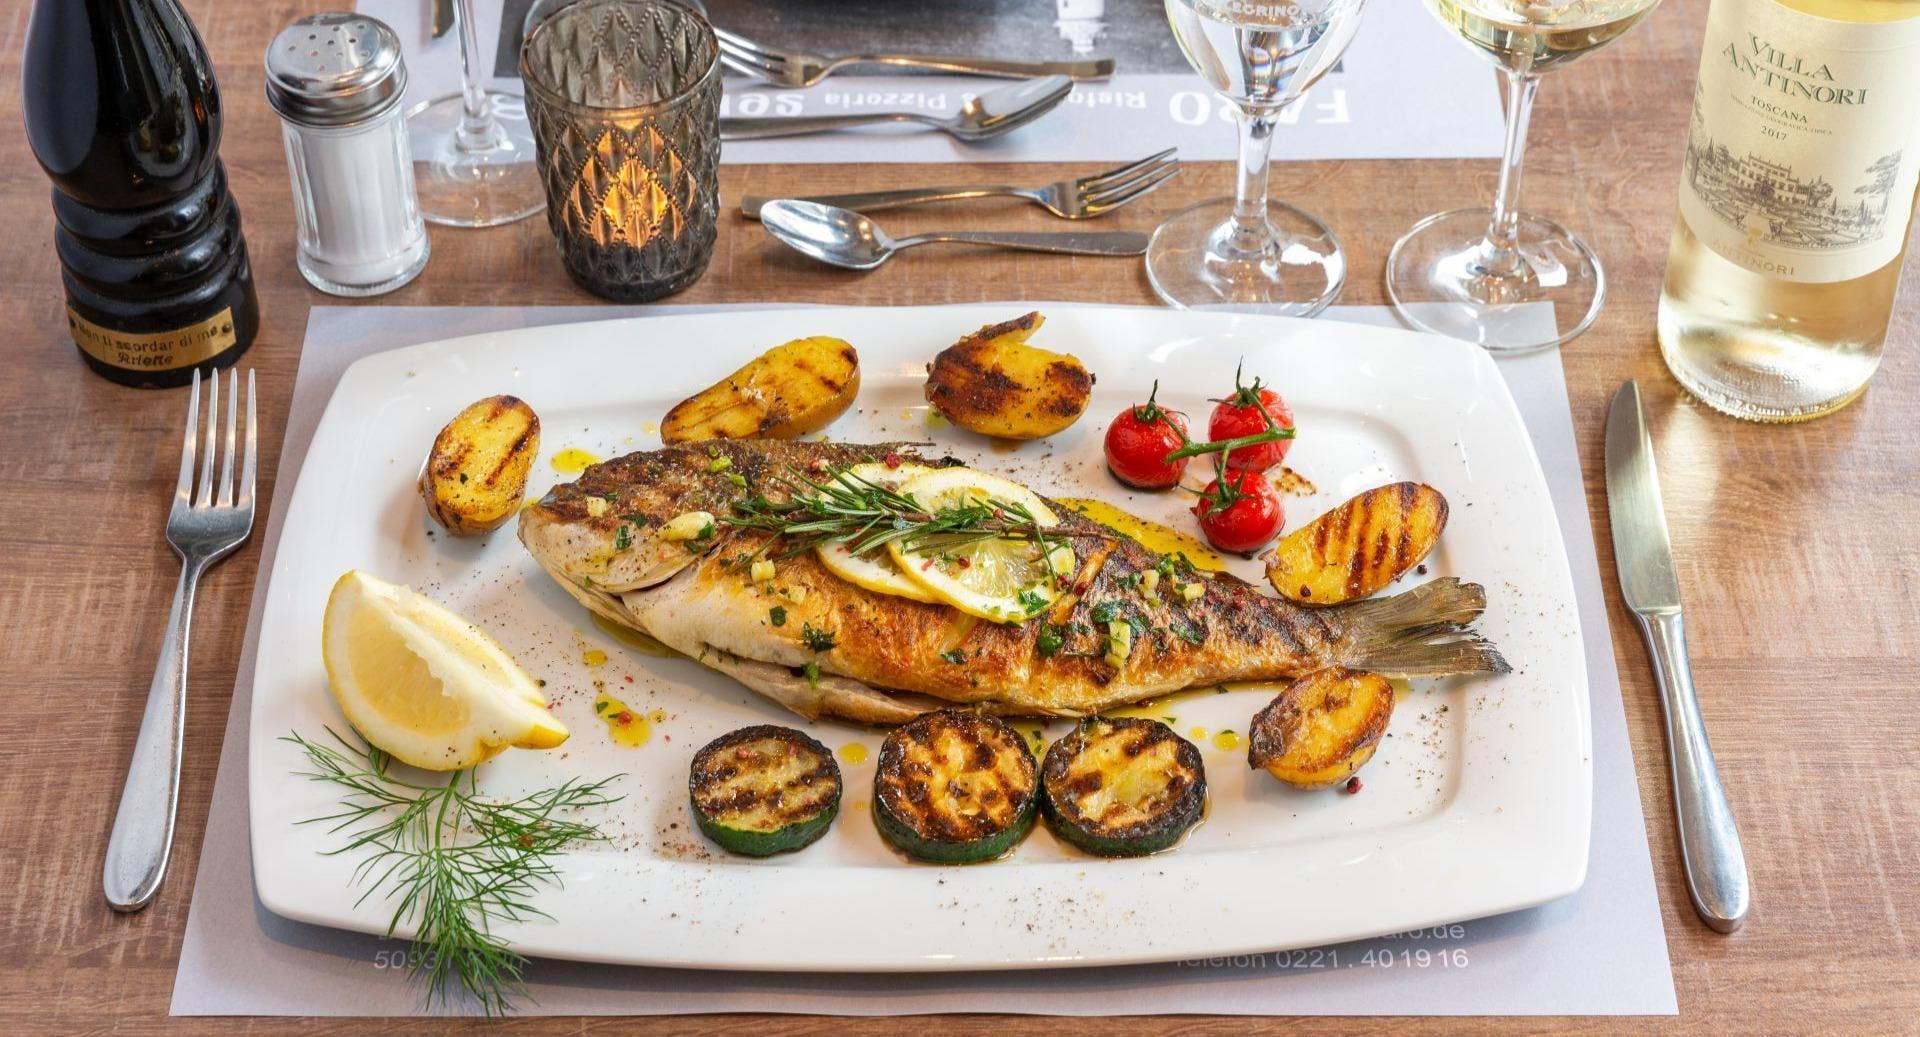 Faro Italienisches Restaurant Cologne image 1